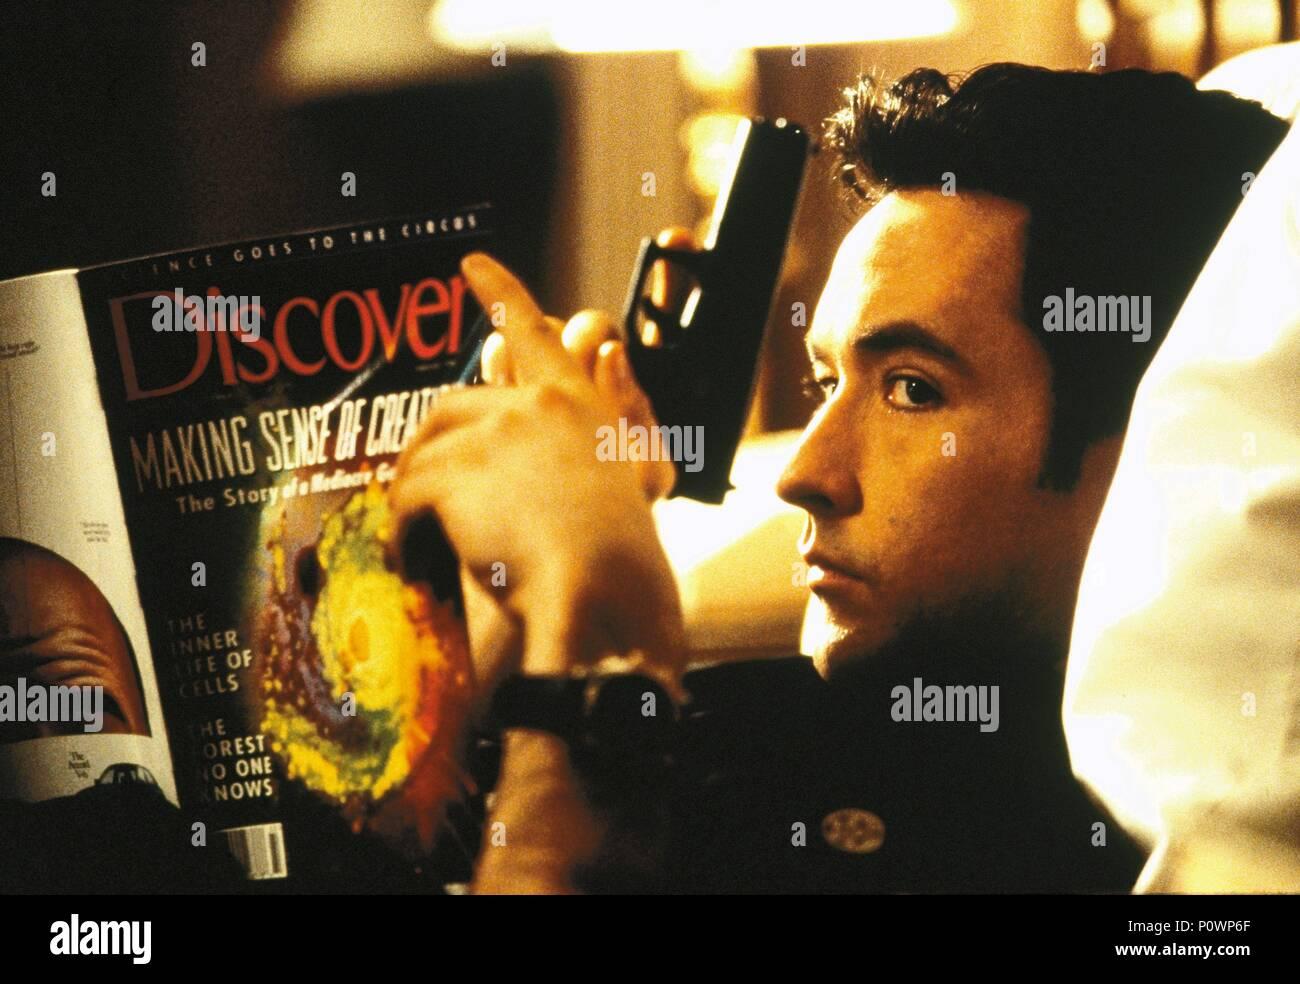 Original Film Title: GROSSE POINTE BLANK.  English Title: GROSSE POINTE BLANK.  Film Director: GEORGE ARMITAGE.  Year: 1997.  Stars: JOHN CUSACK. Credit: HOLLYWOOD PICTURES / GORDON, MELINDA SUE / Album - Stock Image